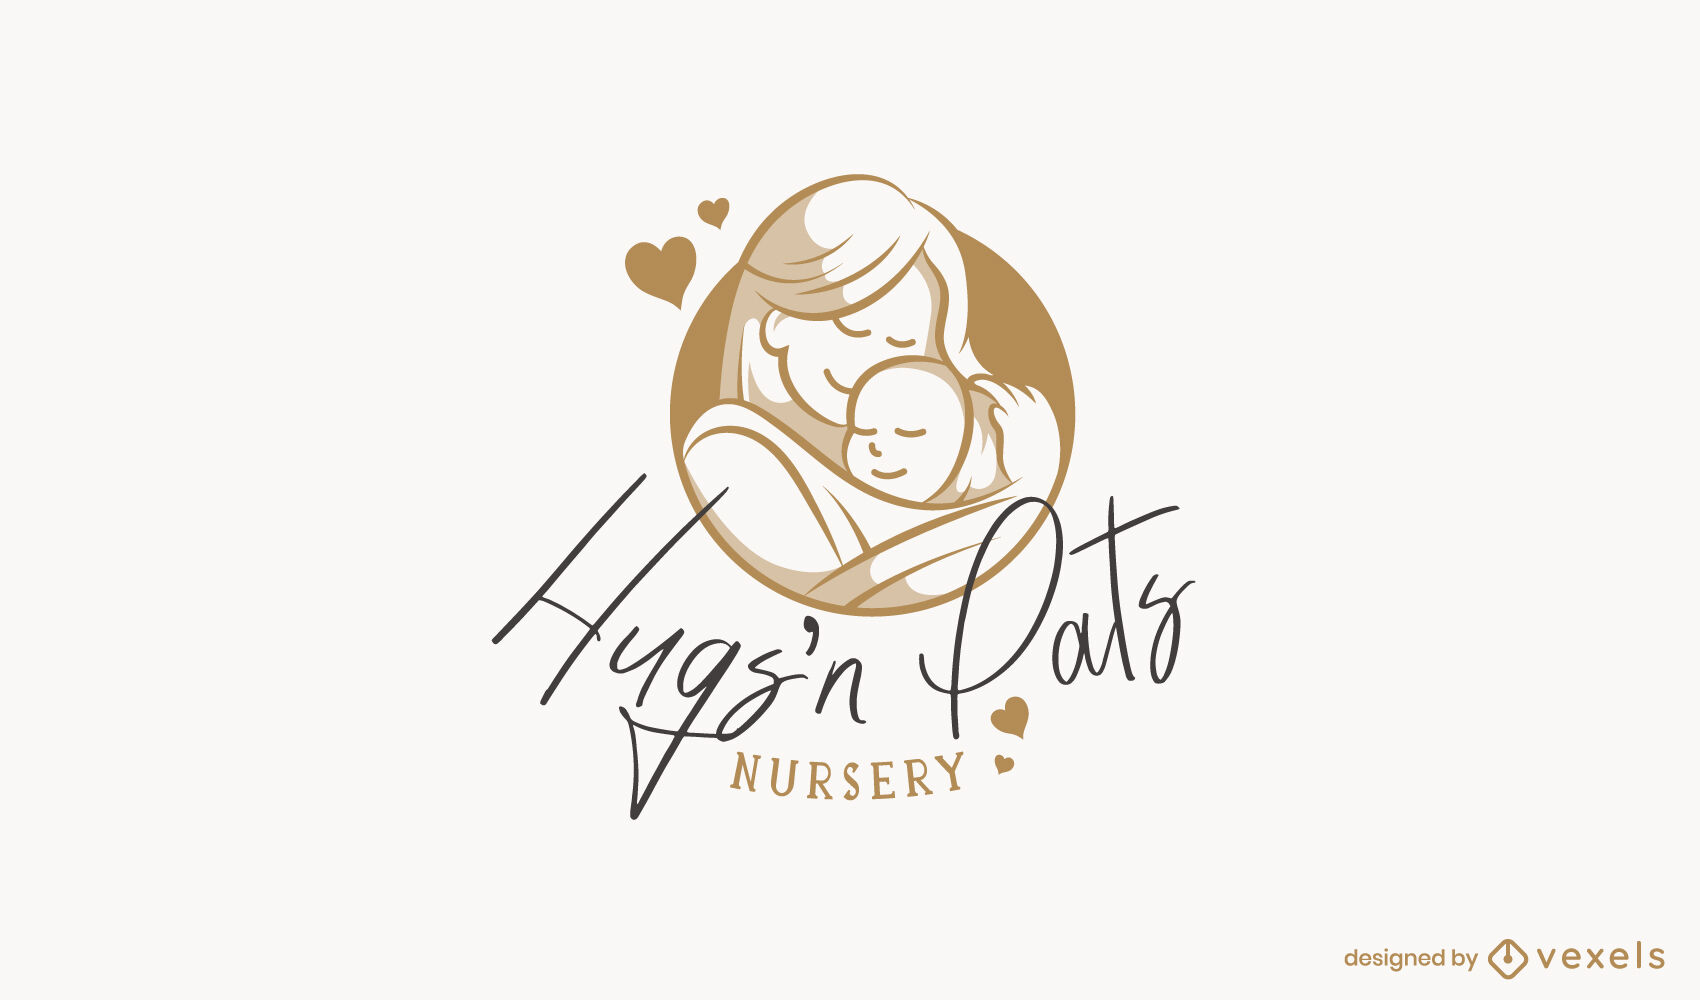 Nursery children care logo template